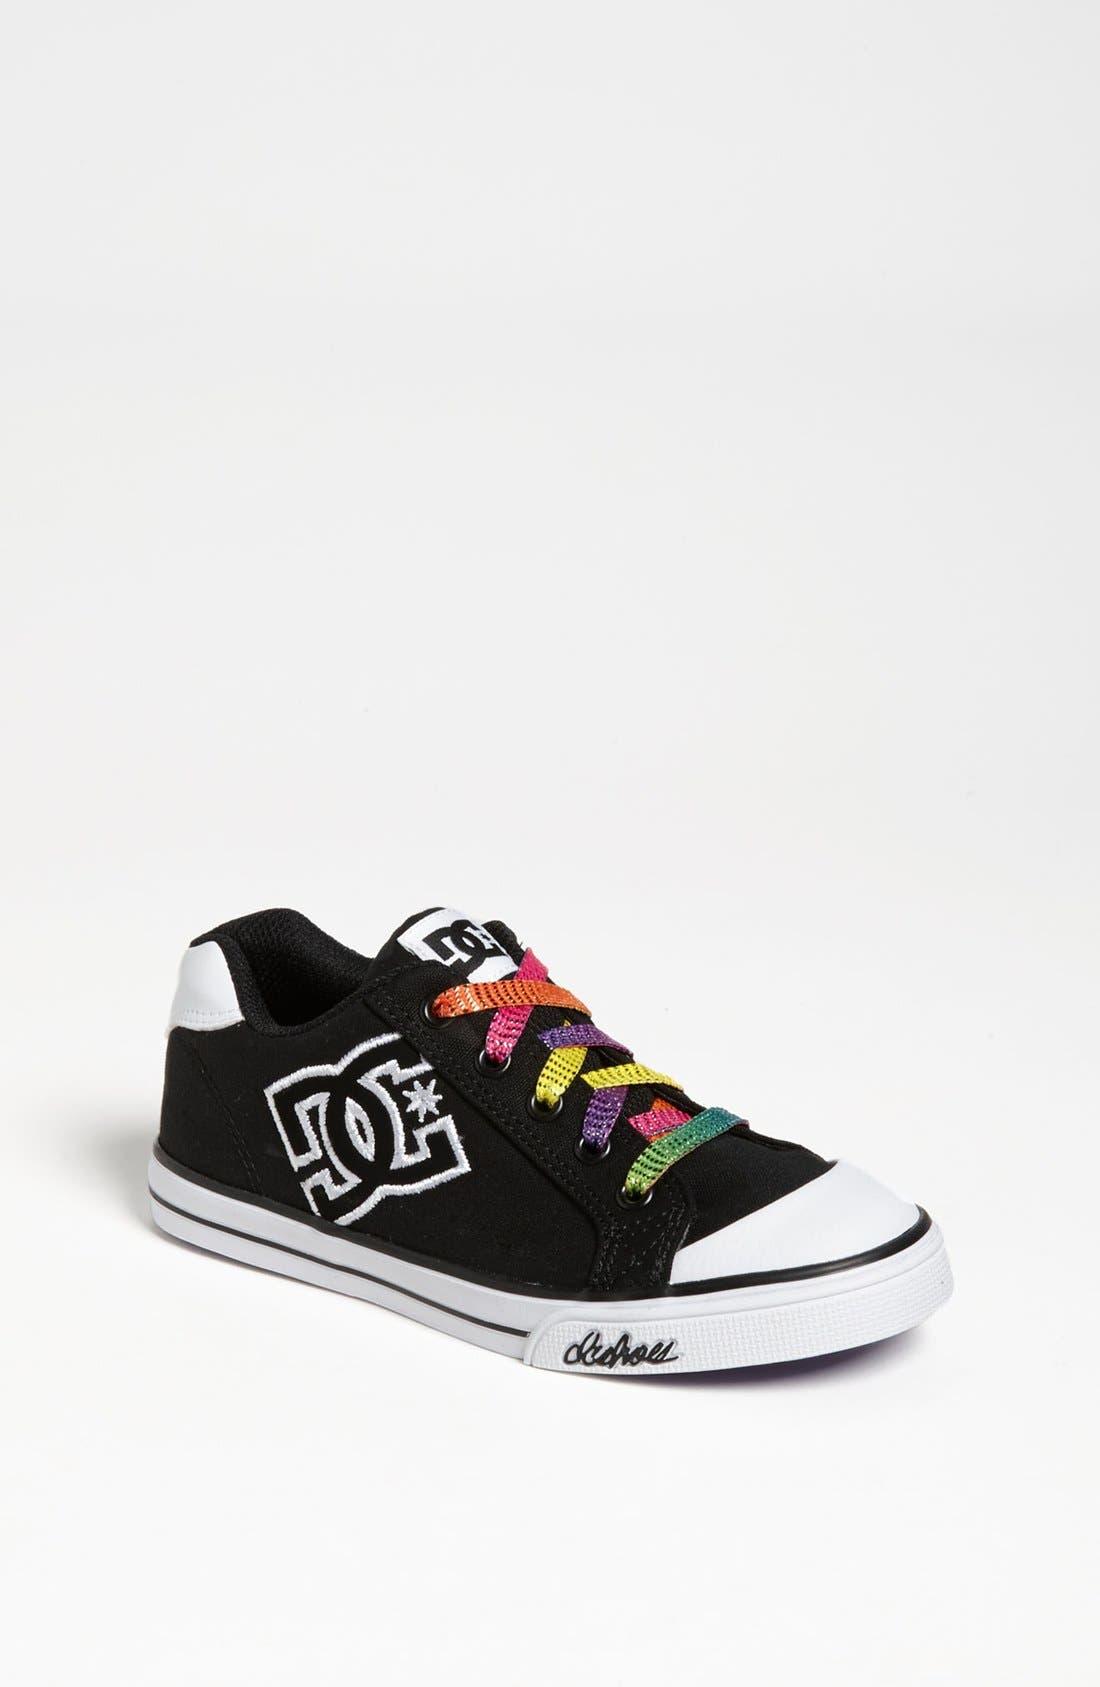 Alternate Image 1 Selected - DC Shoes 'Chelsea' Sneaker (Toddler, Little Kid & Big Kid)